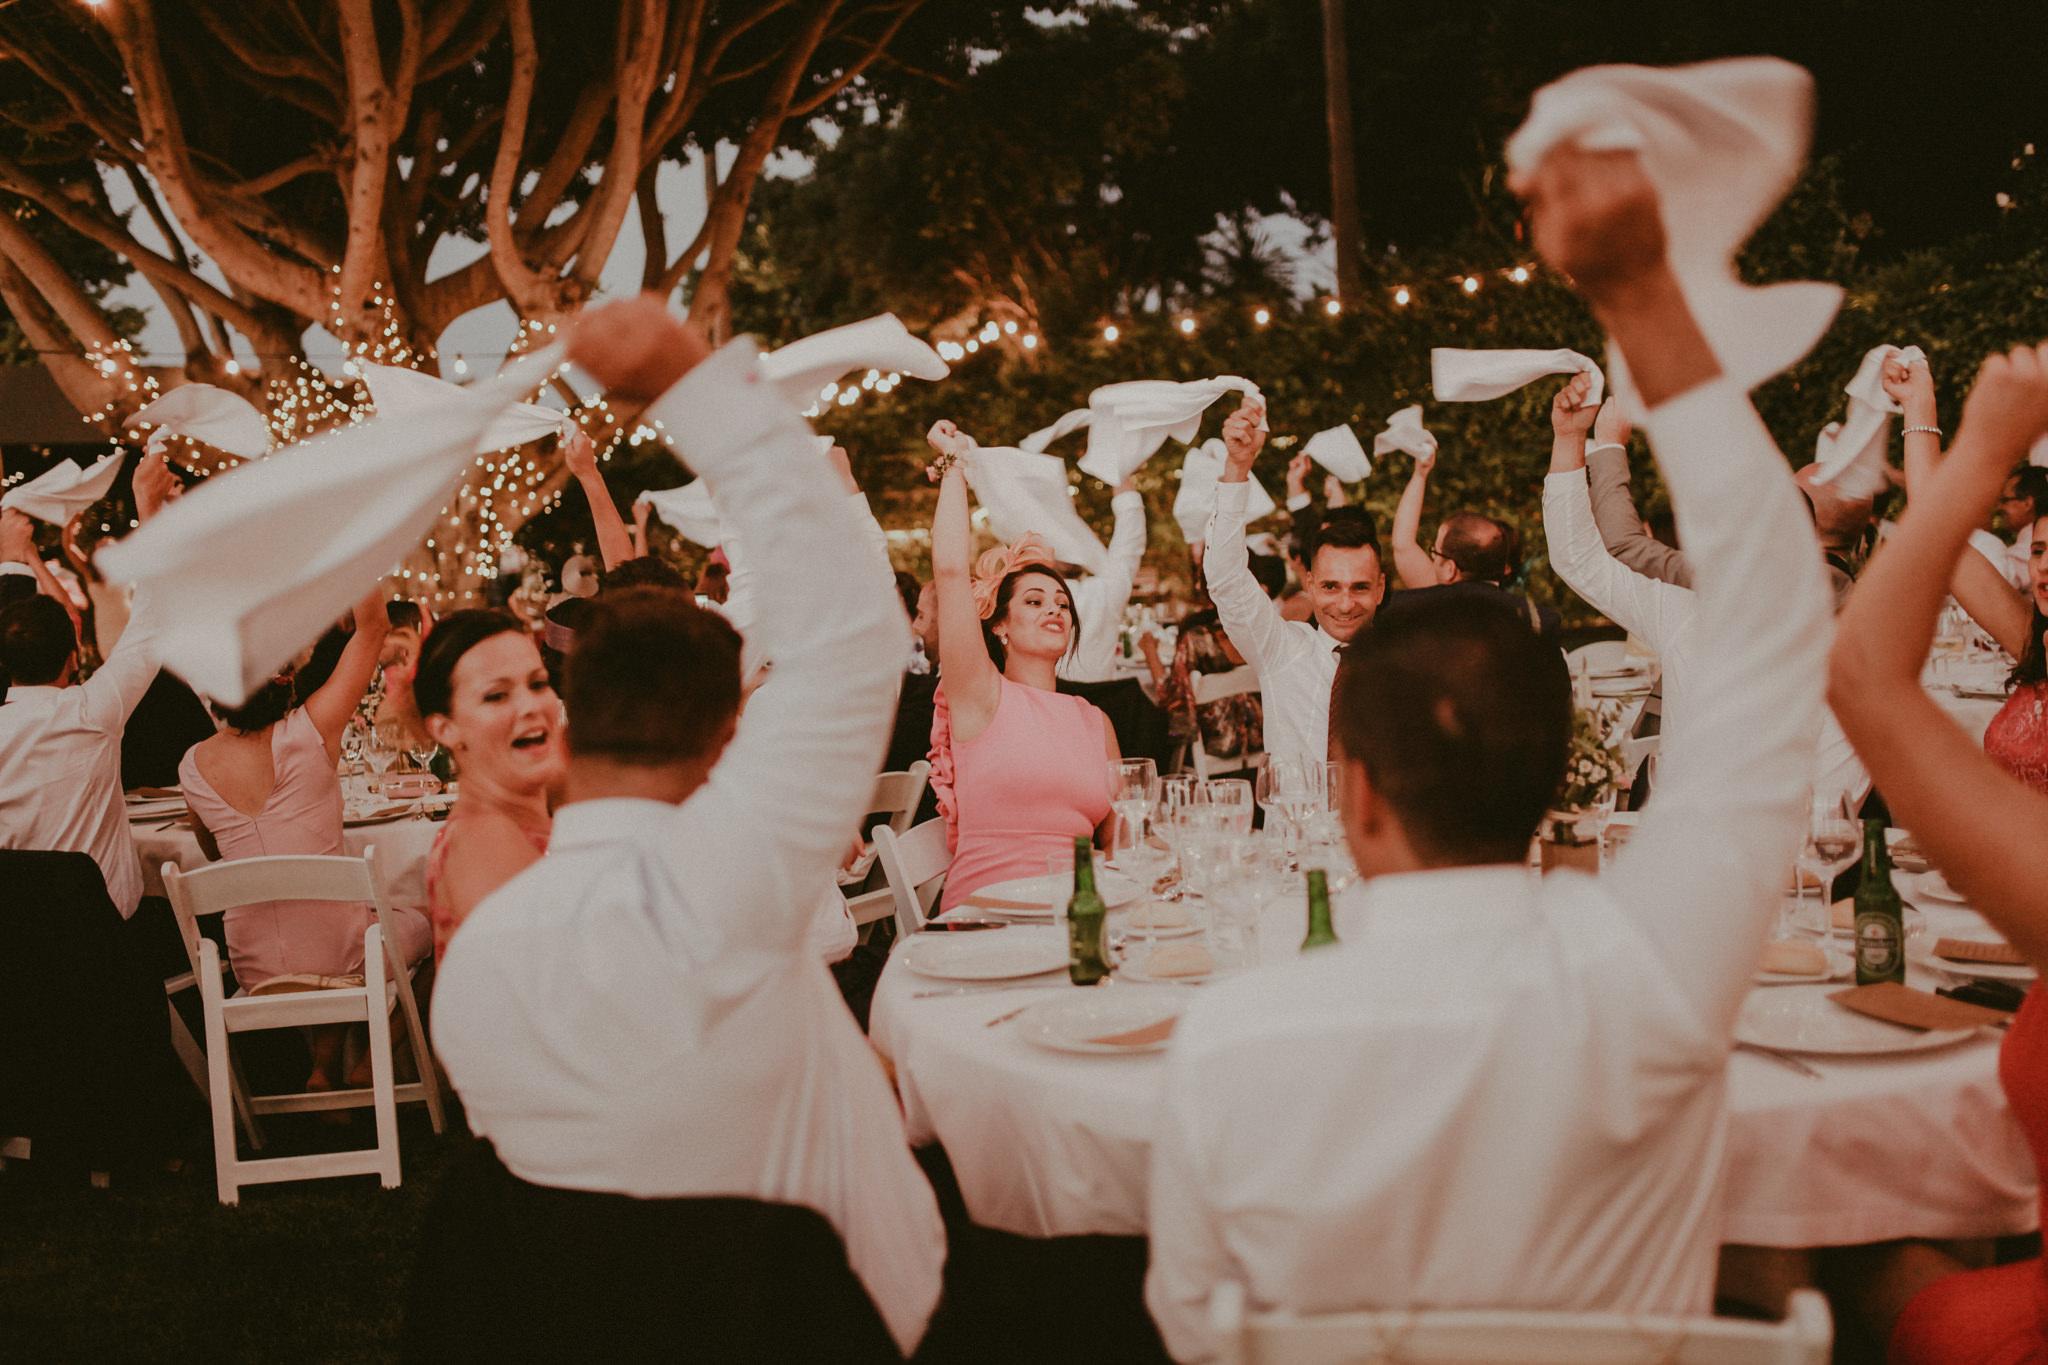 boda-diferente-fotografo-boda-laspalmas-grancanaria-72